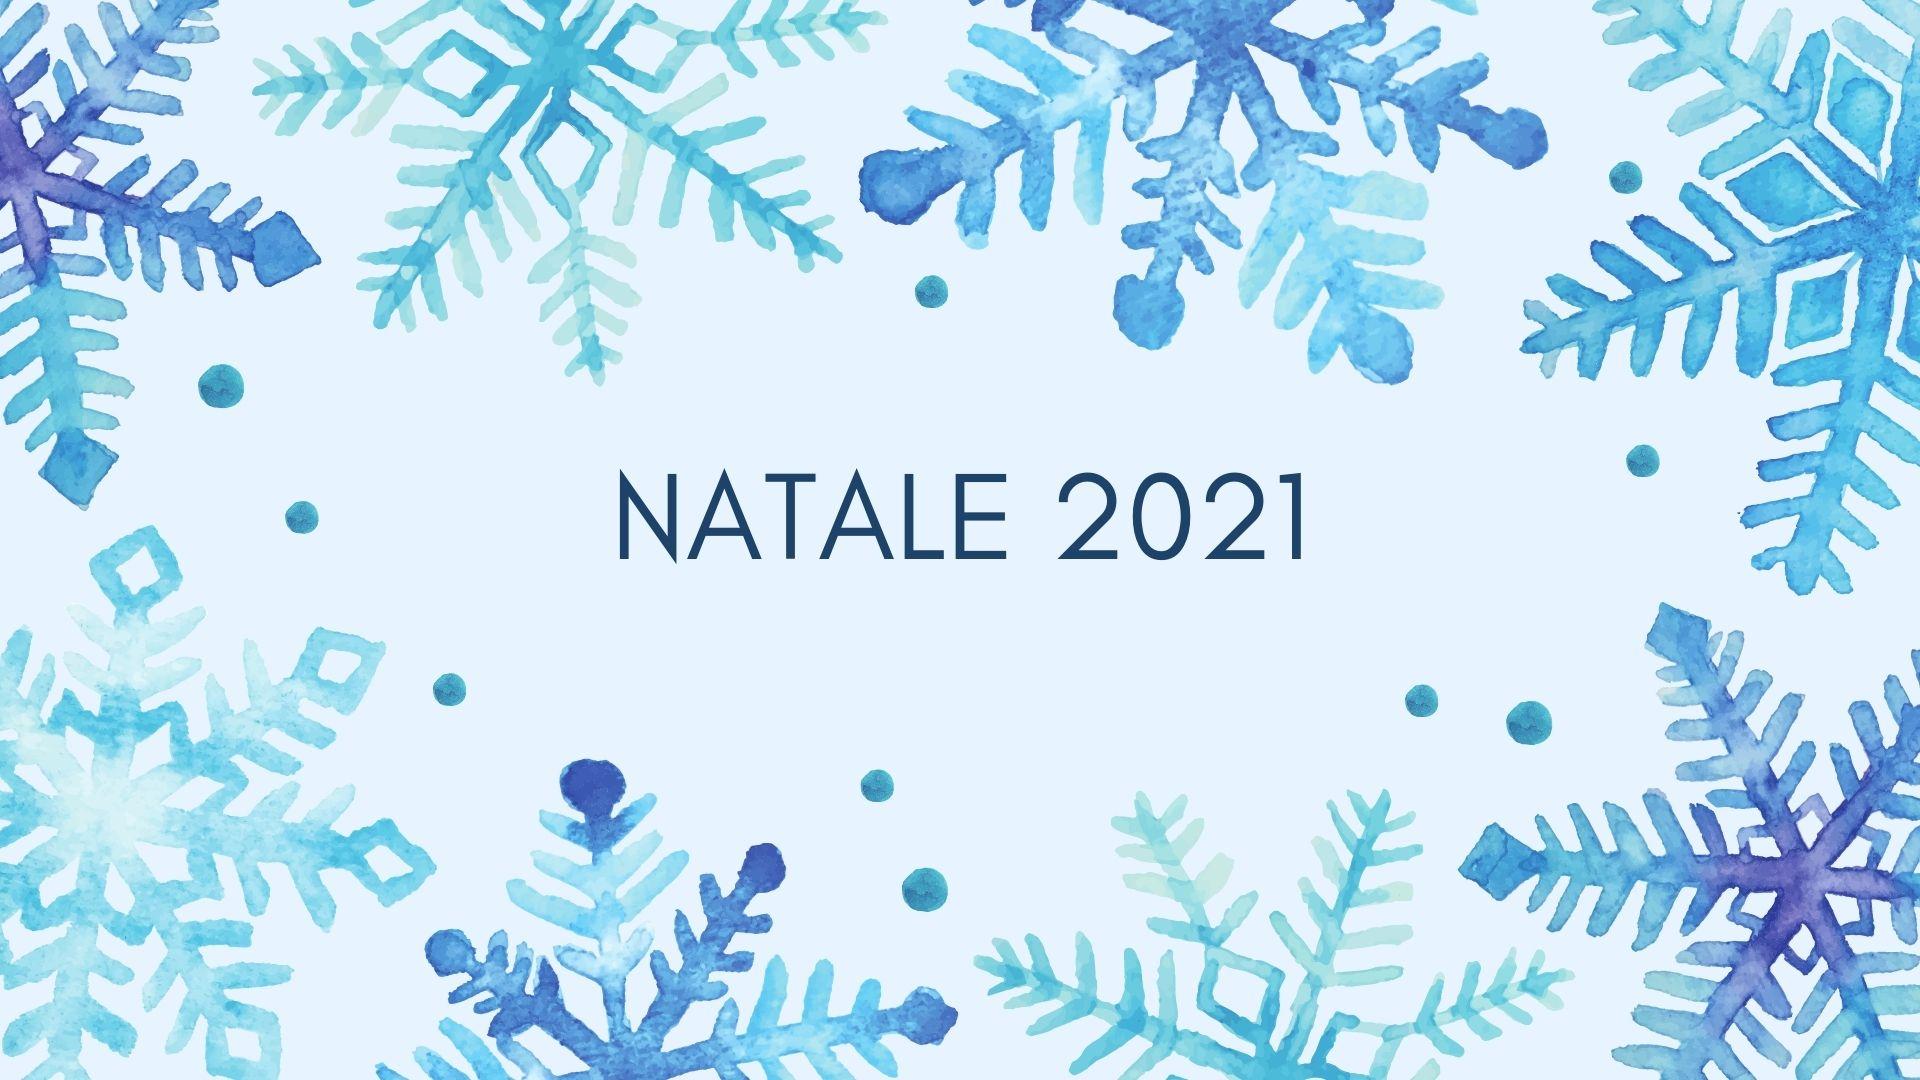 NATALE 2021